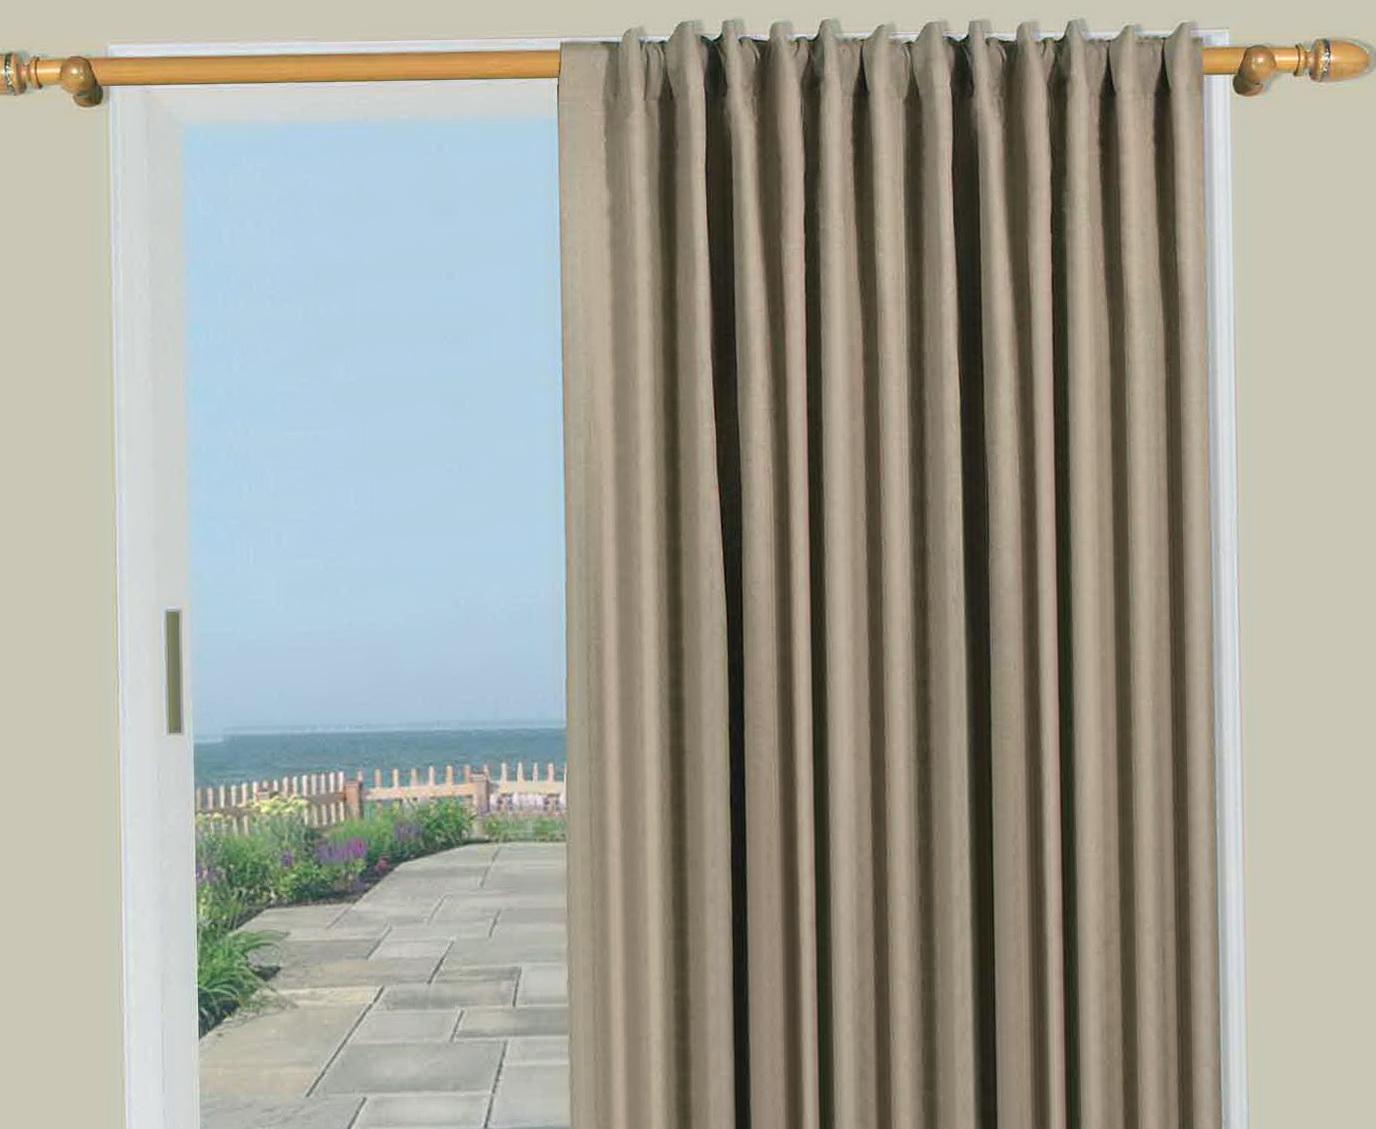 Patio door curtains ikea home design ideas for Ikea outdoor curtains